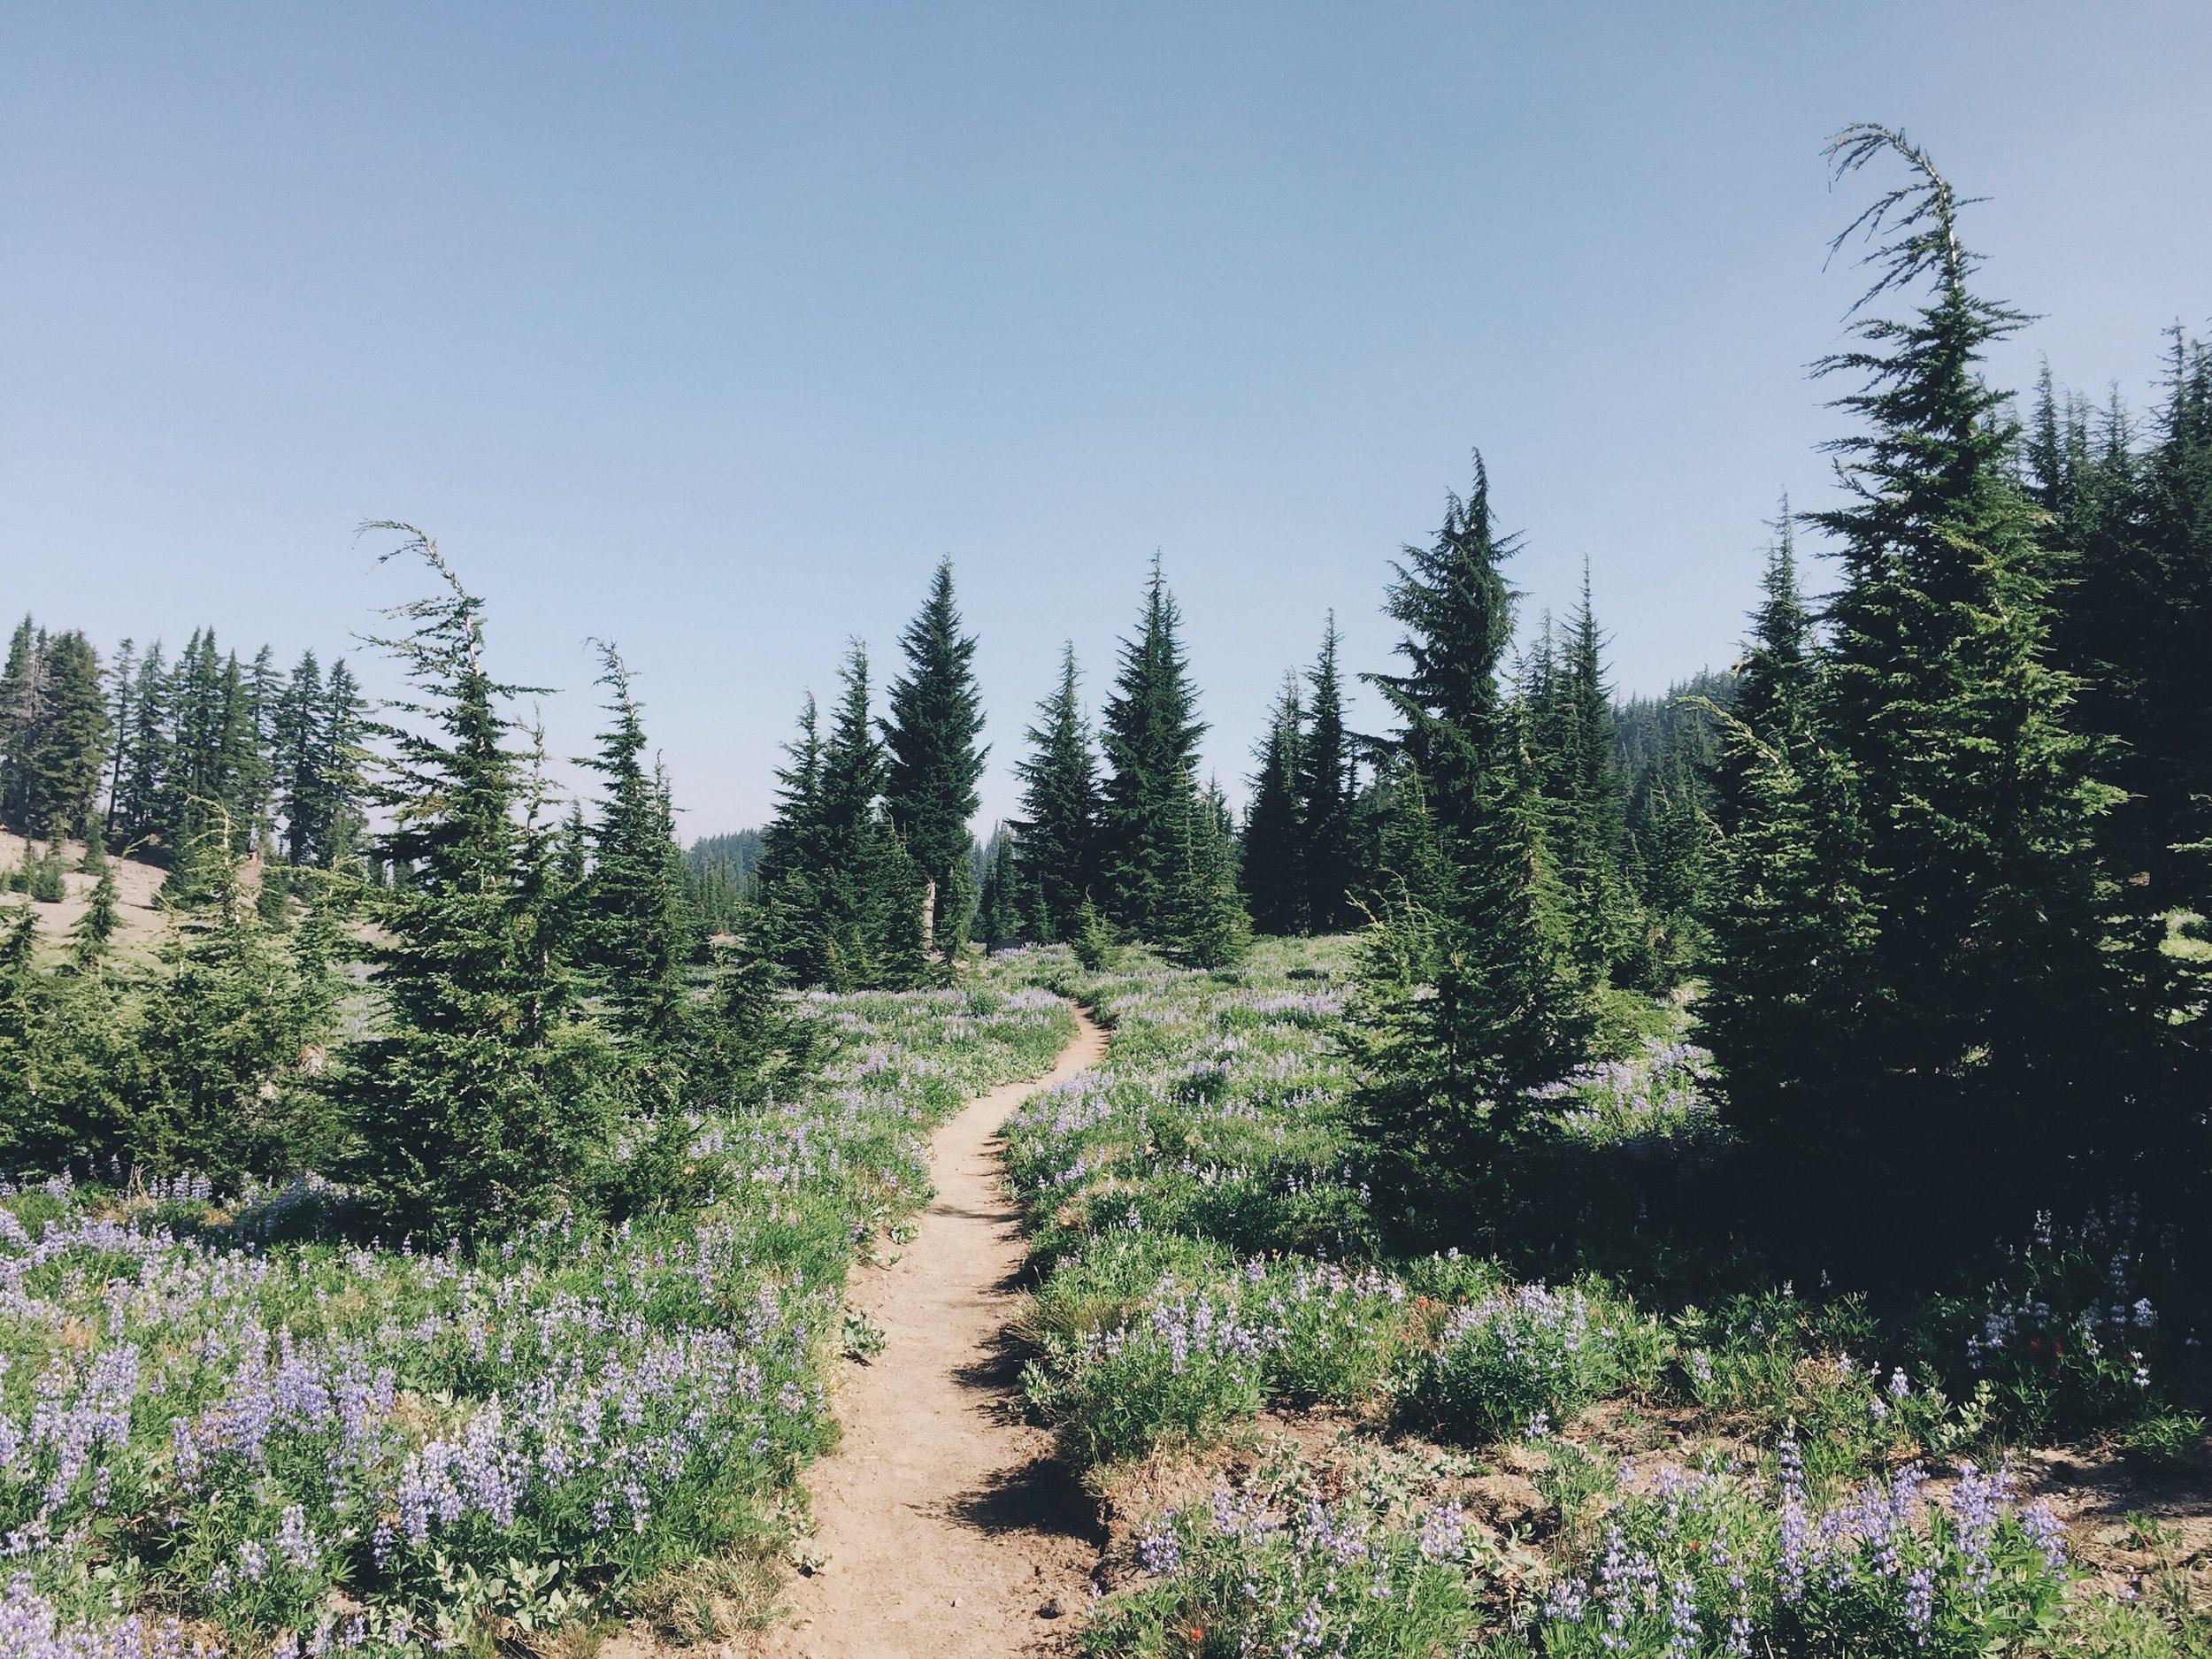 Lush lupine fields